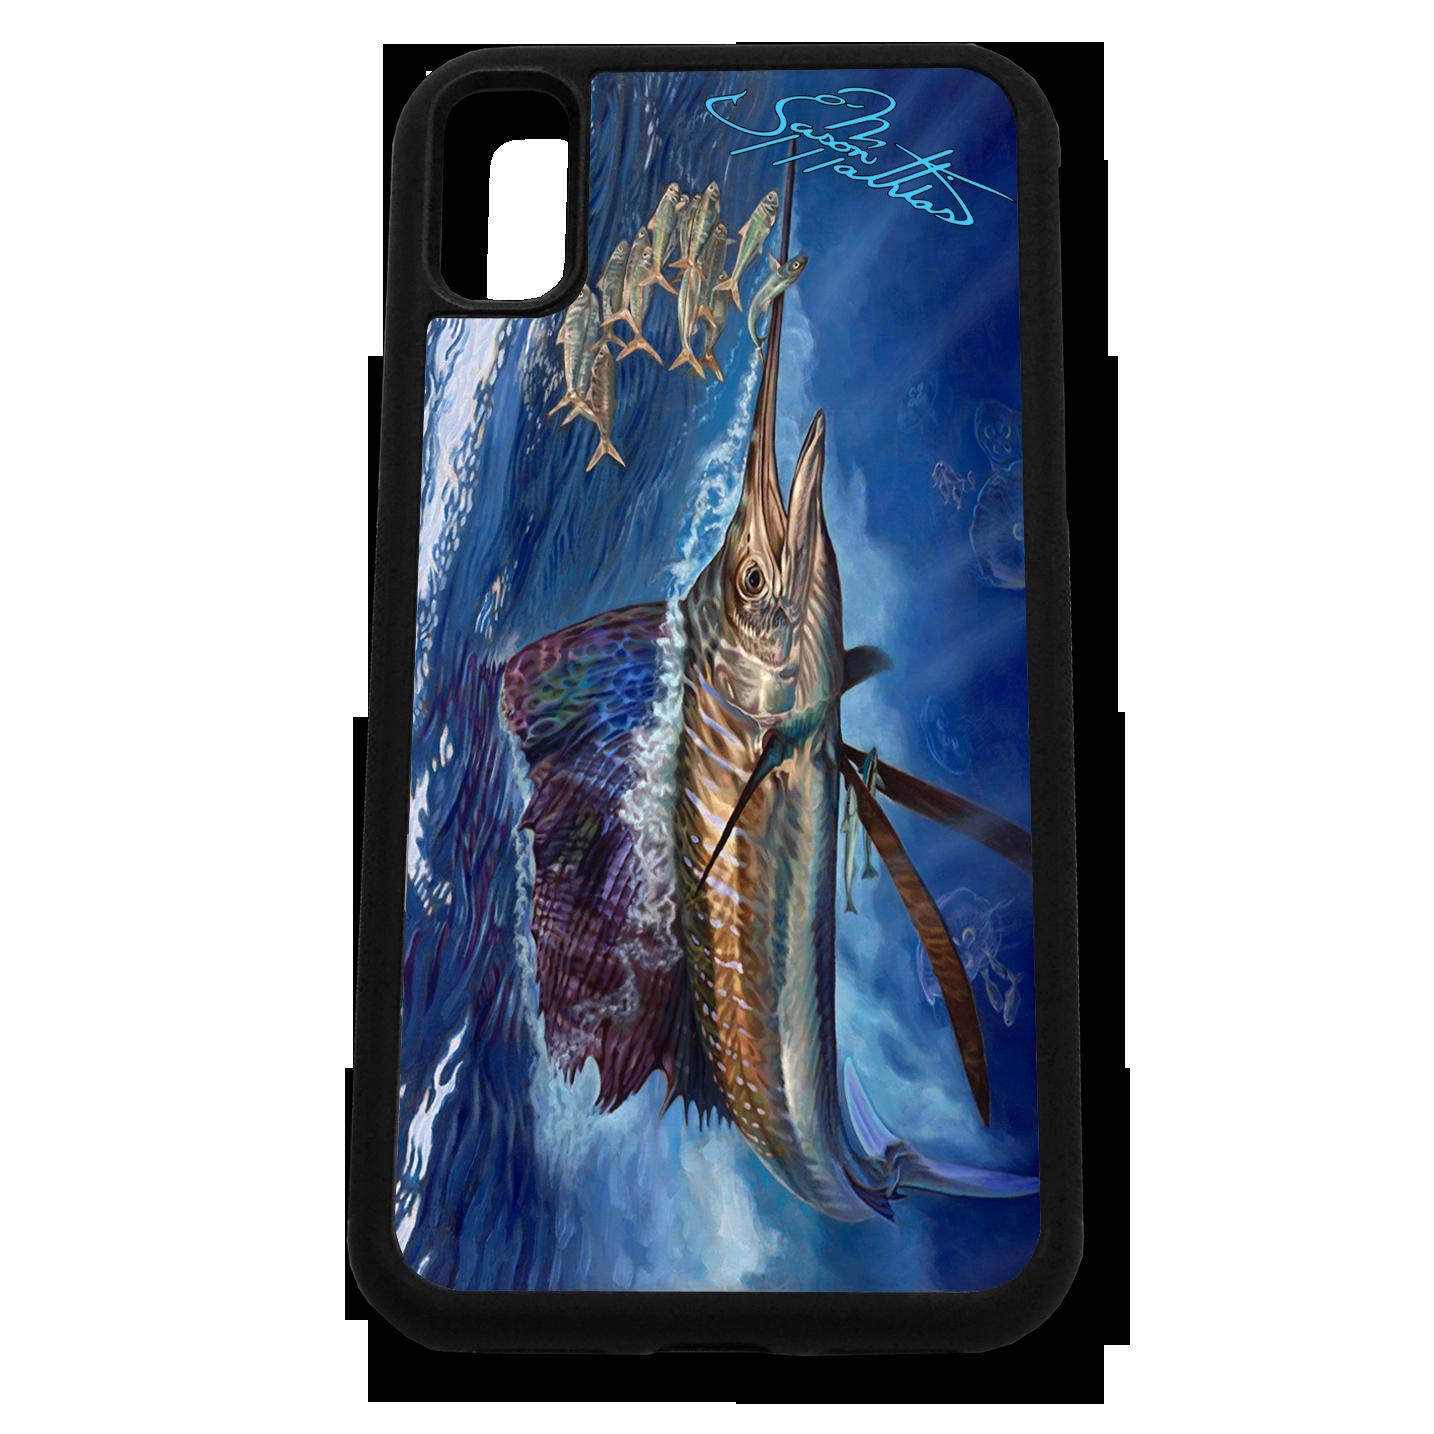 iphone-x-case-sailfish.png